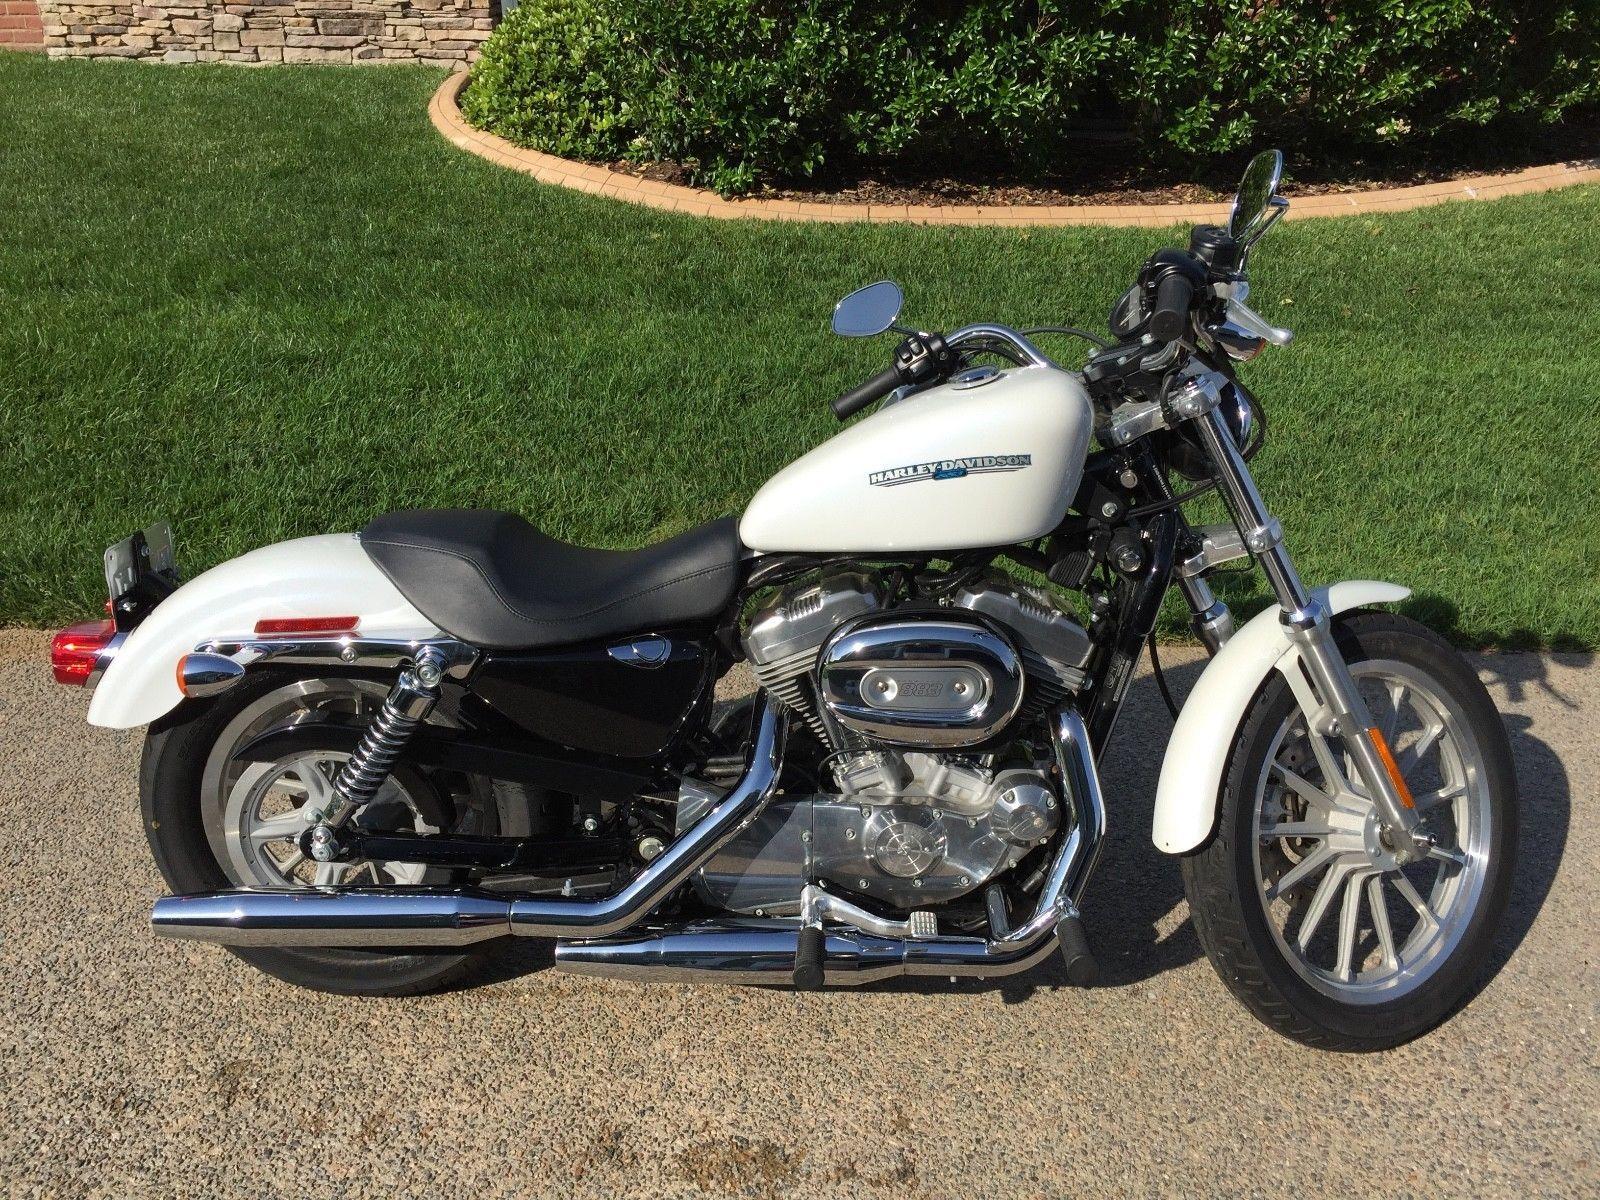 #harley 2006 Harley-Davidson Street 2006 HD Sportster 883 Low (XL883L)  please